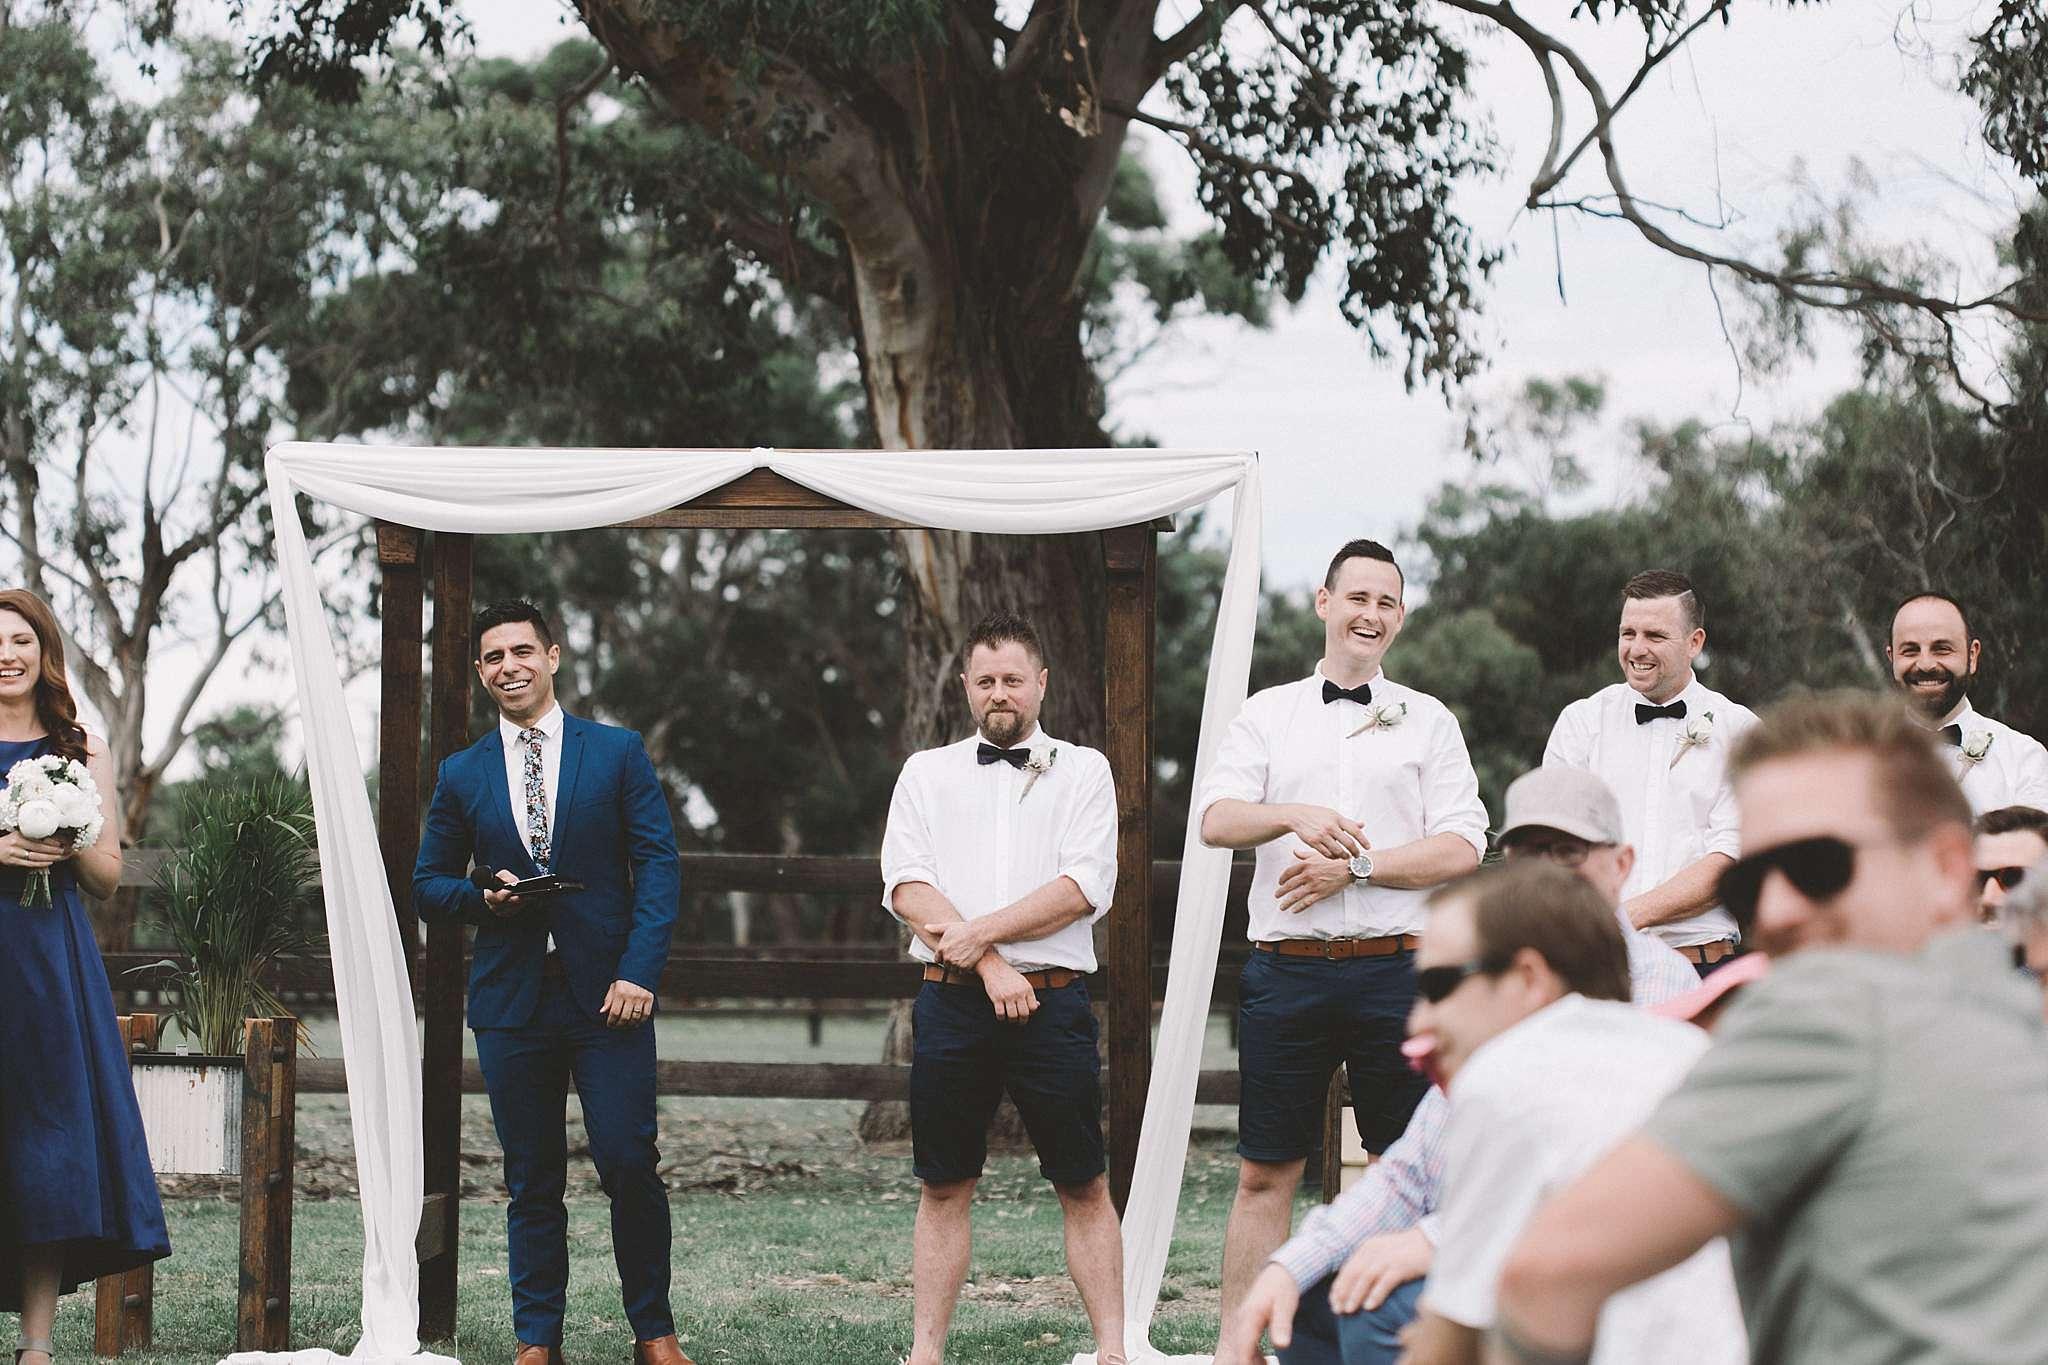 Mornington Peninsula Wedding Photographer 89.JPG